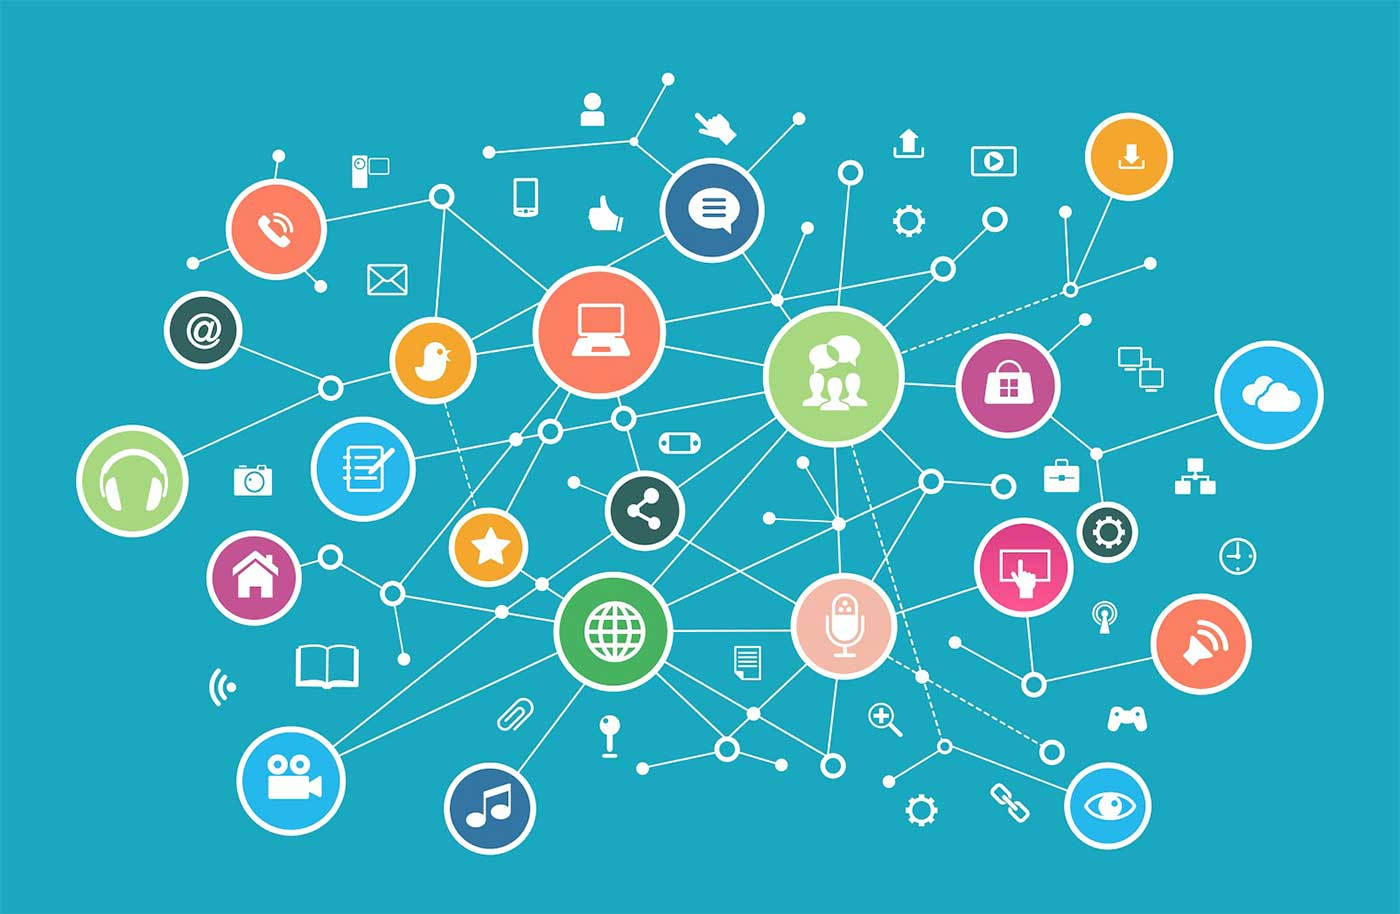 دیجیتال مارکتینگ با طعم هوش مصنوعی